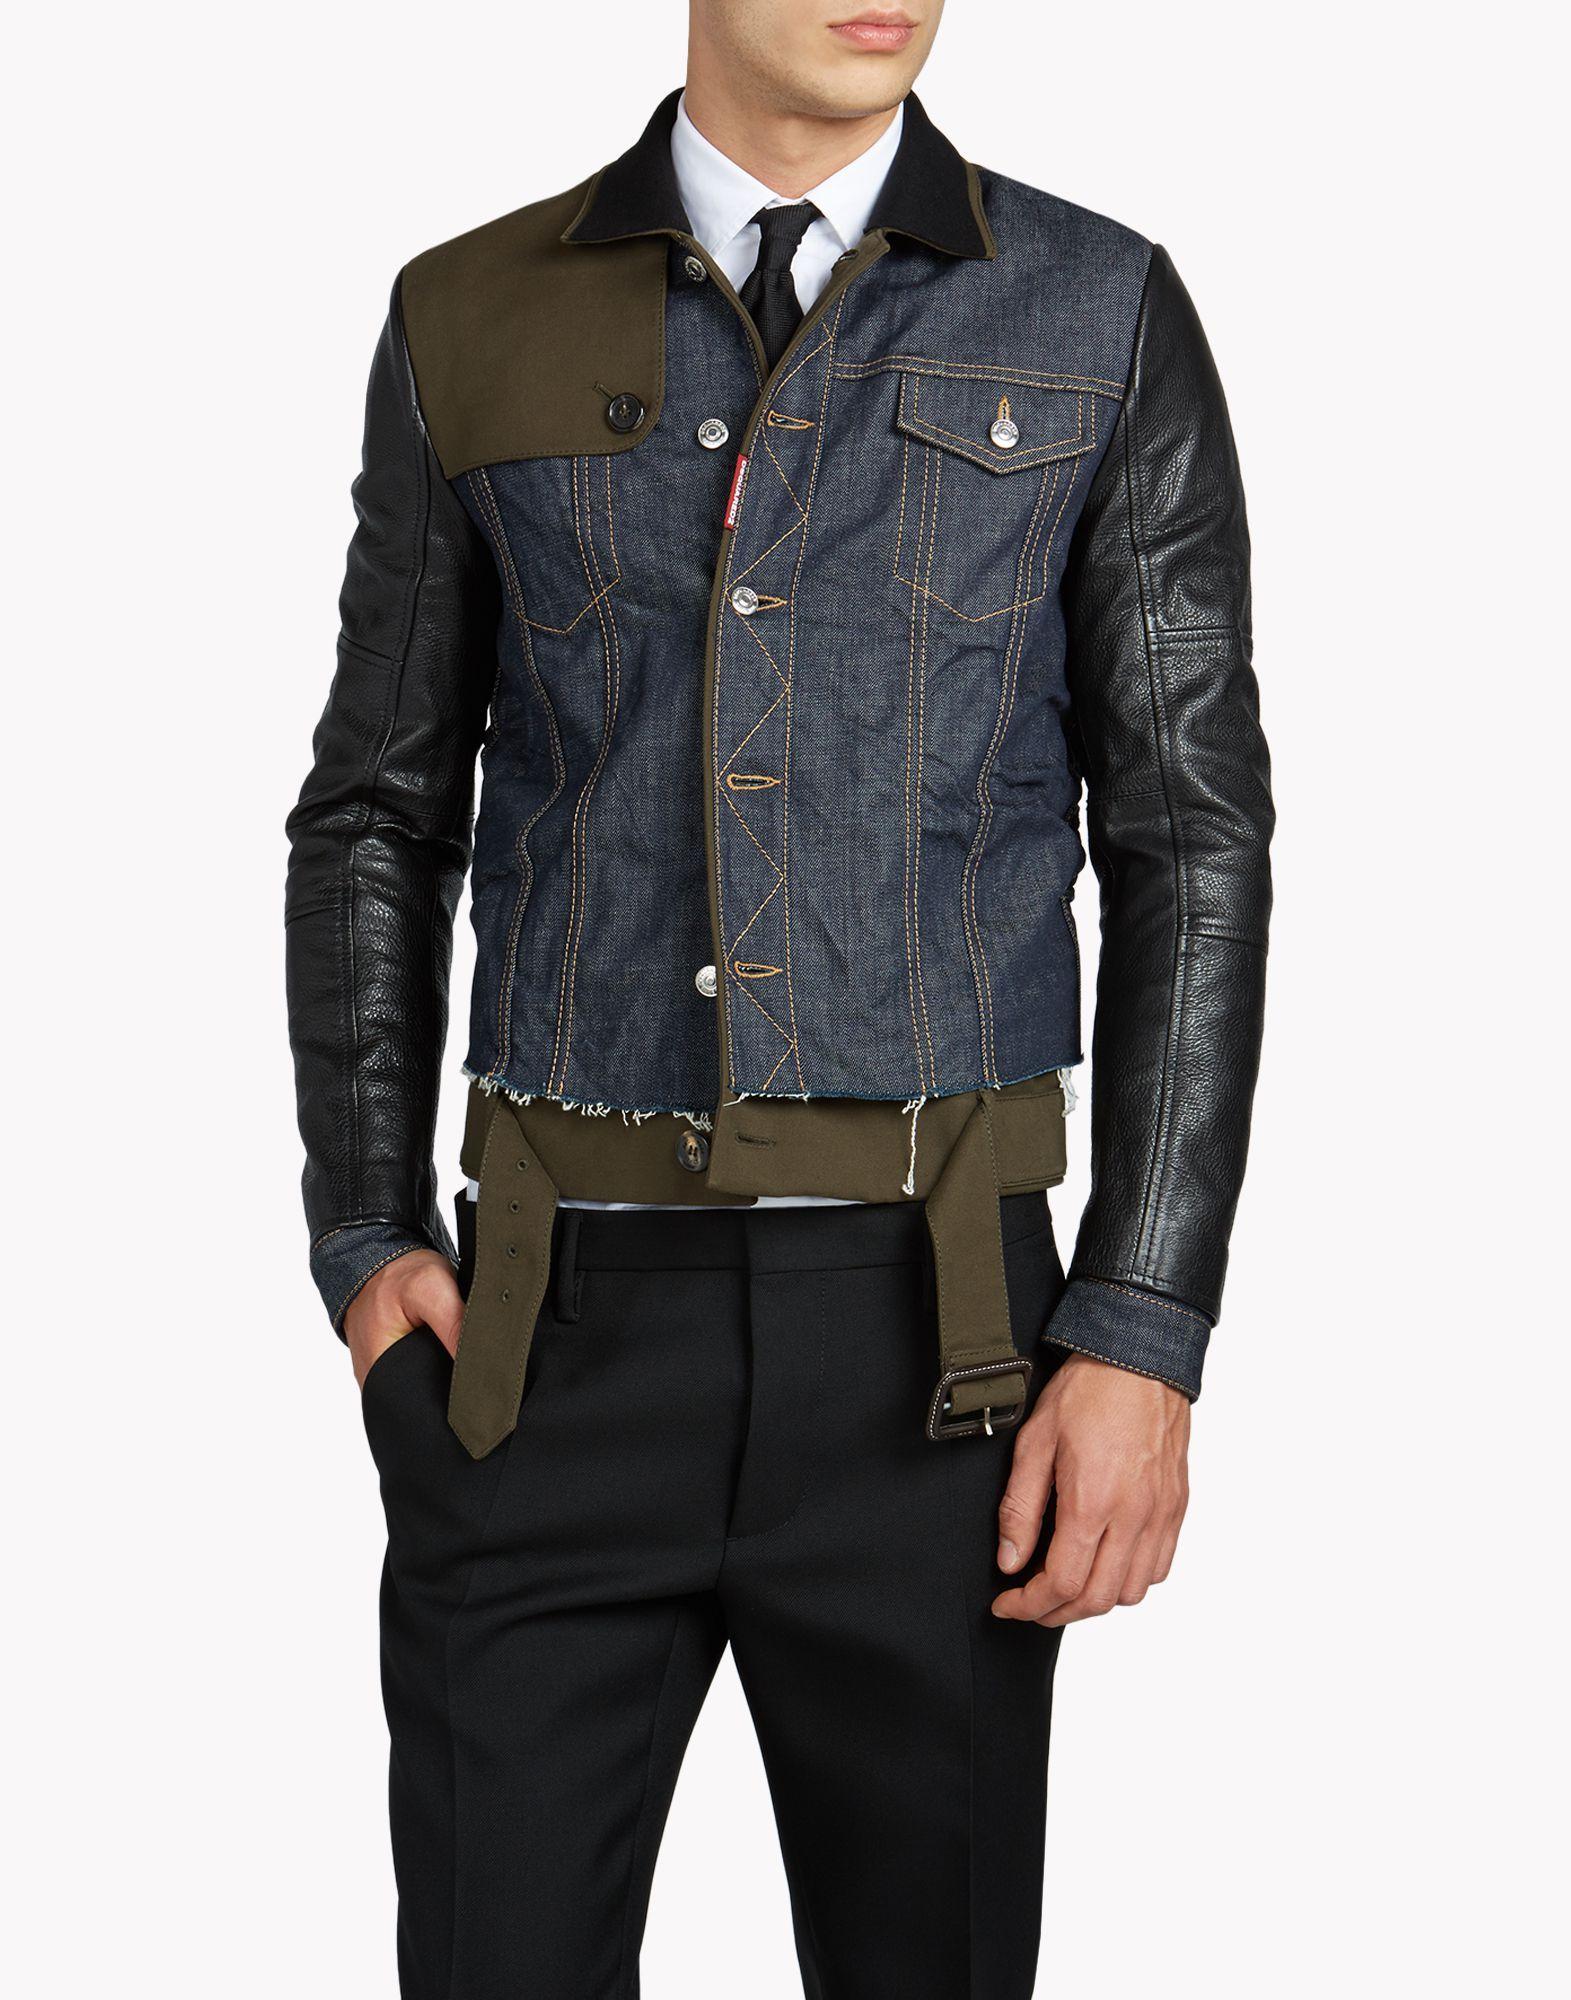 c200f6b09d0 Trench Biker Jean Jacket - Jacket Men - Dsquared Official Online Store